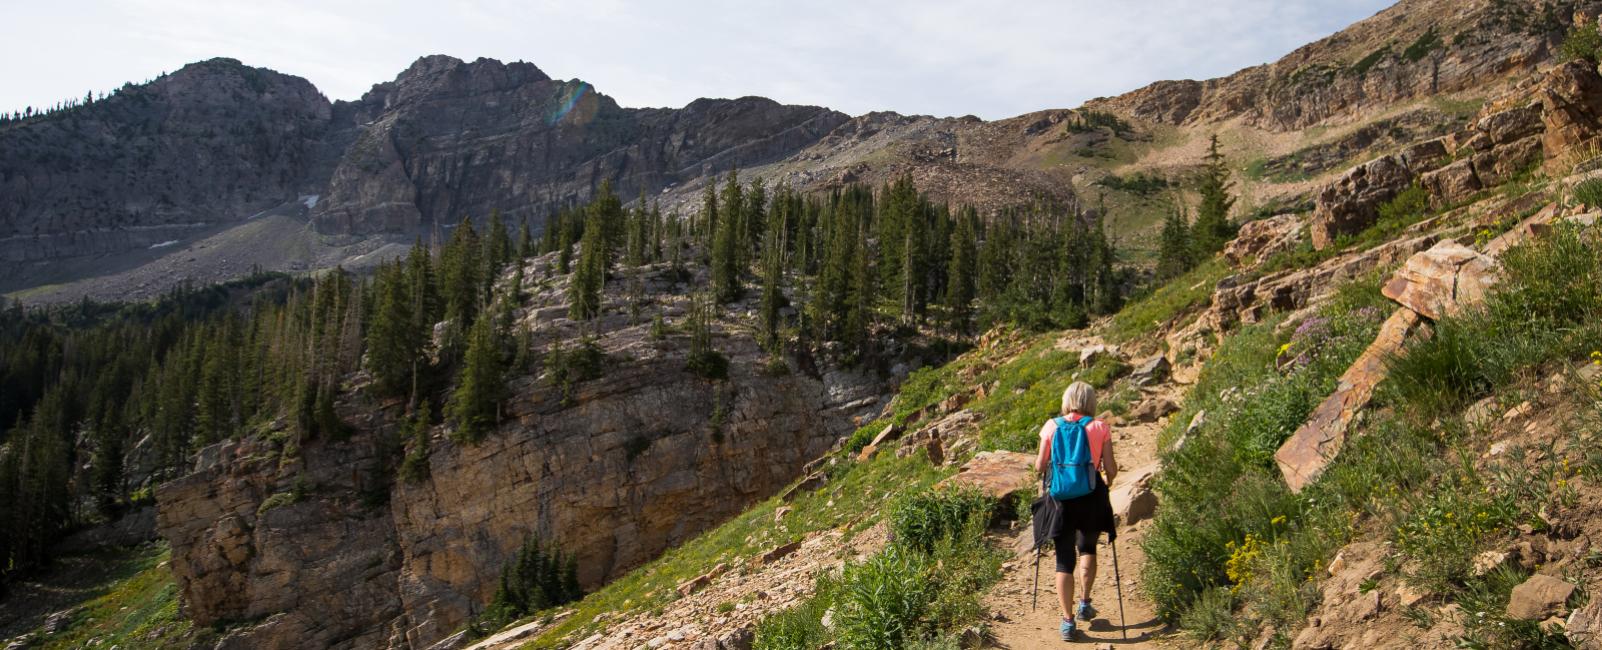 Family Backpacking Getaways Near Salt Lake City